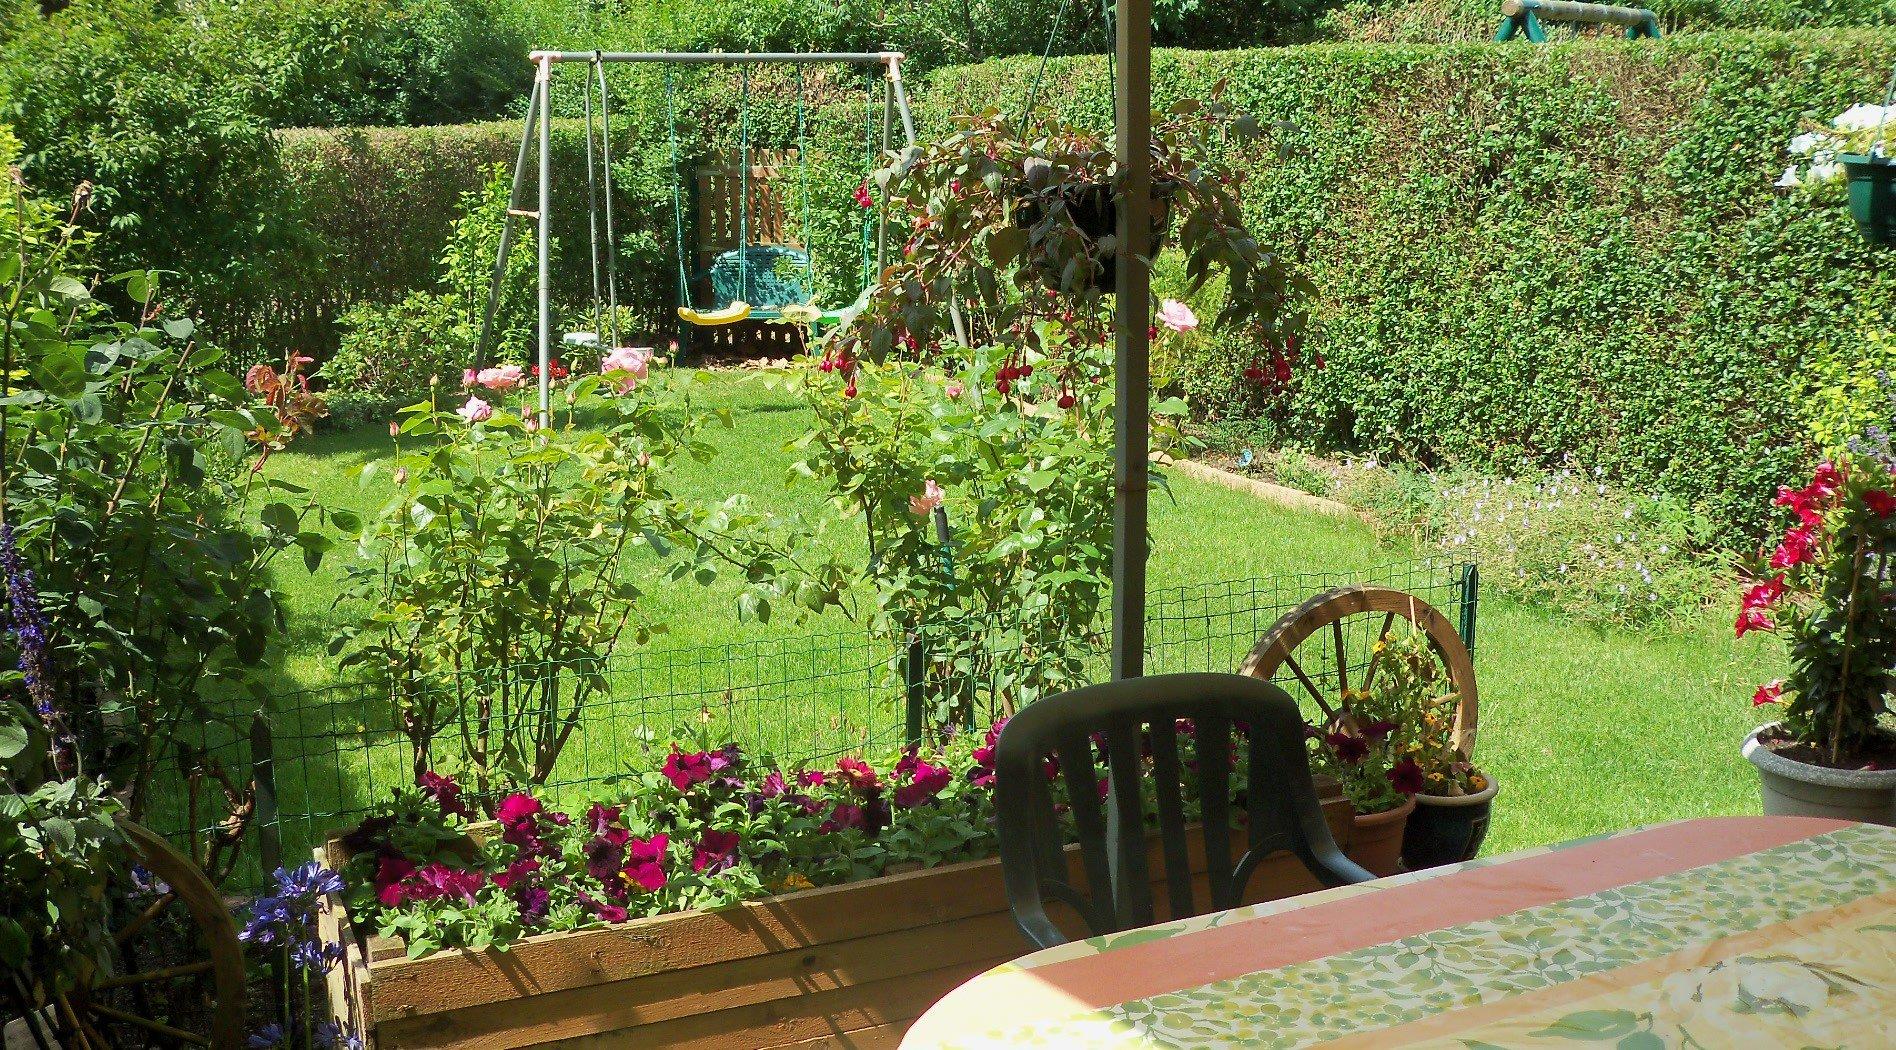 Mon petit jardin - Mon jardin - Belle c'est moi - Photos ...